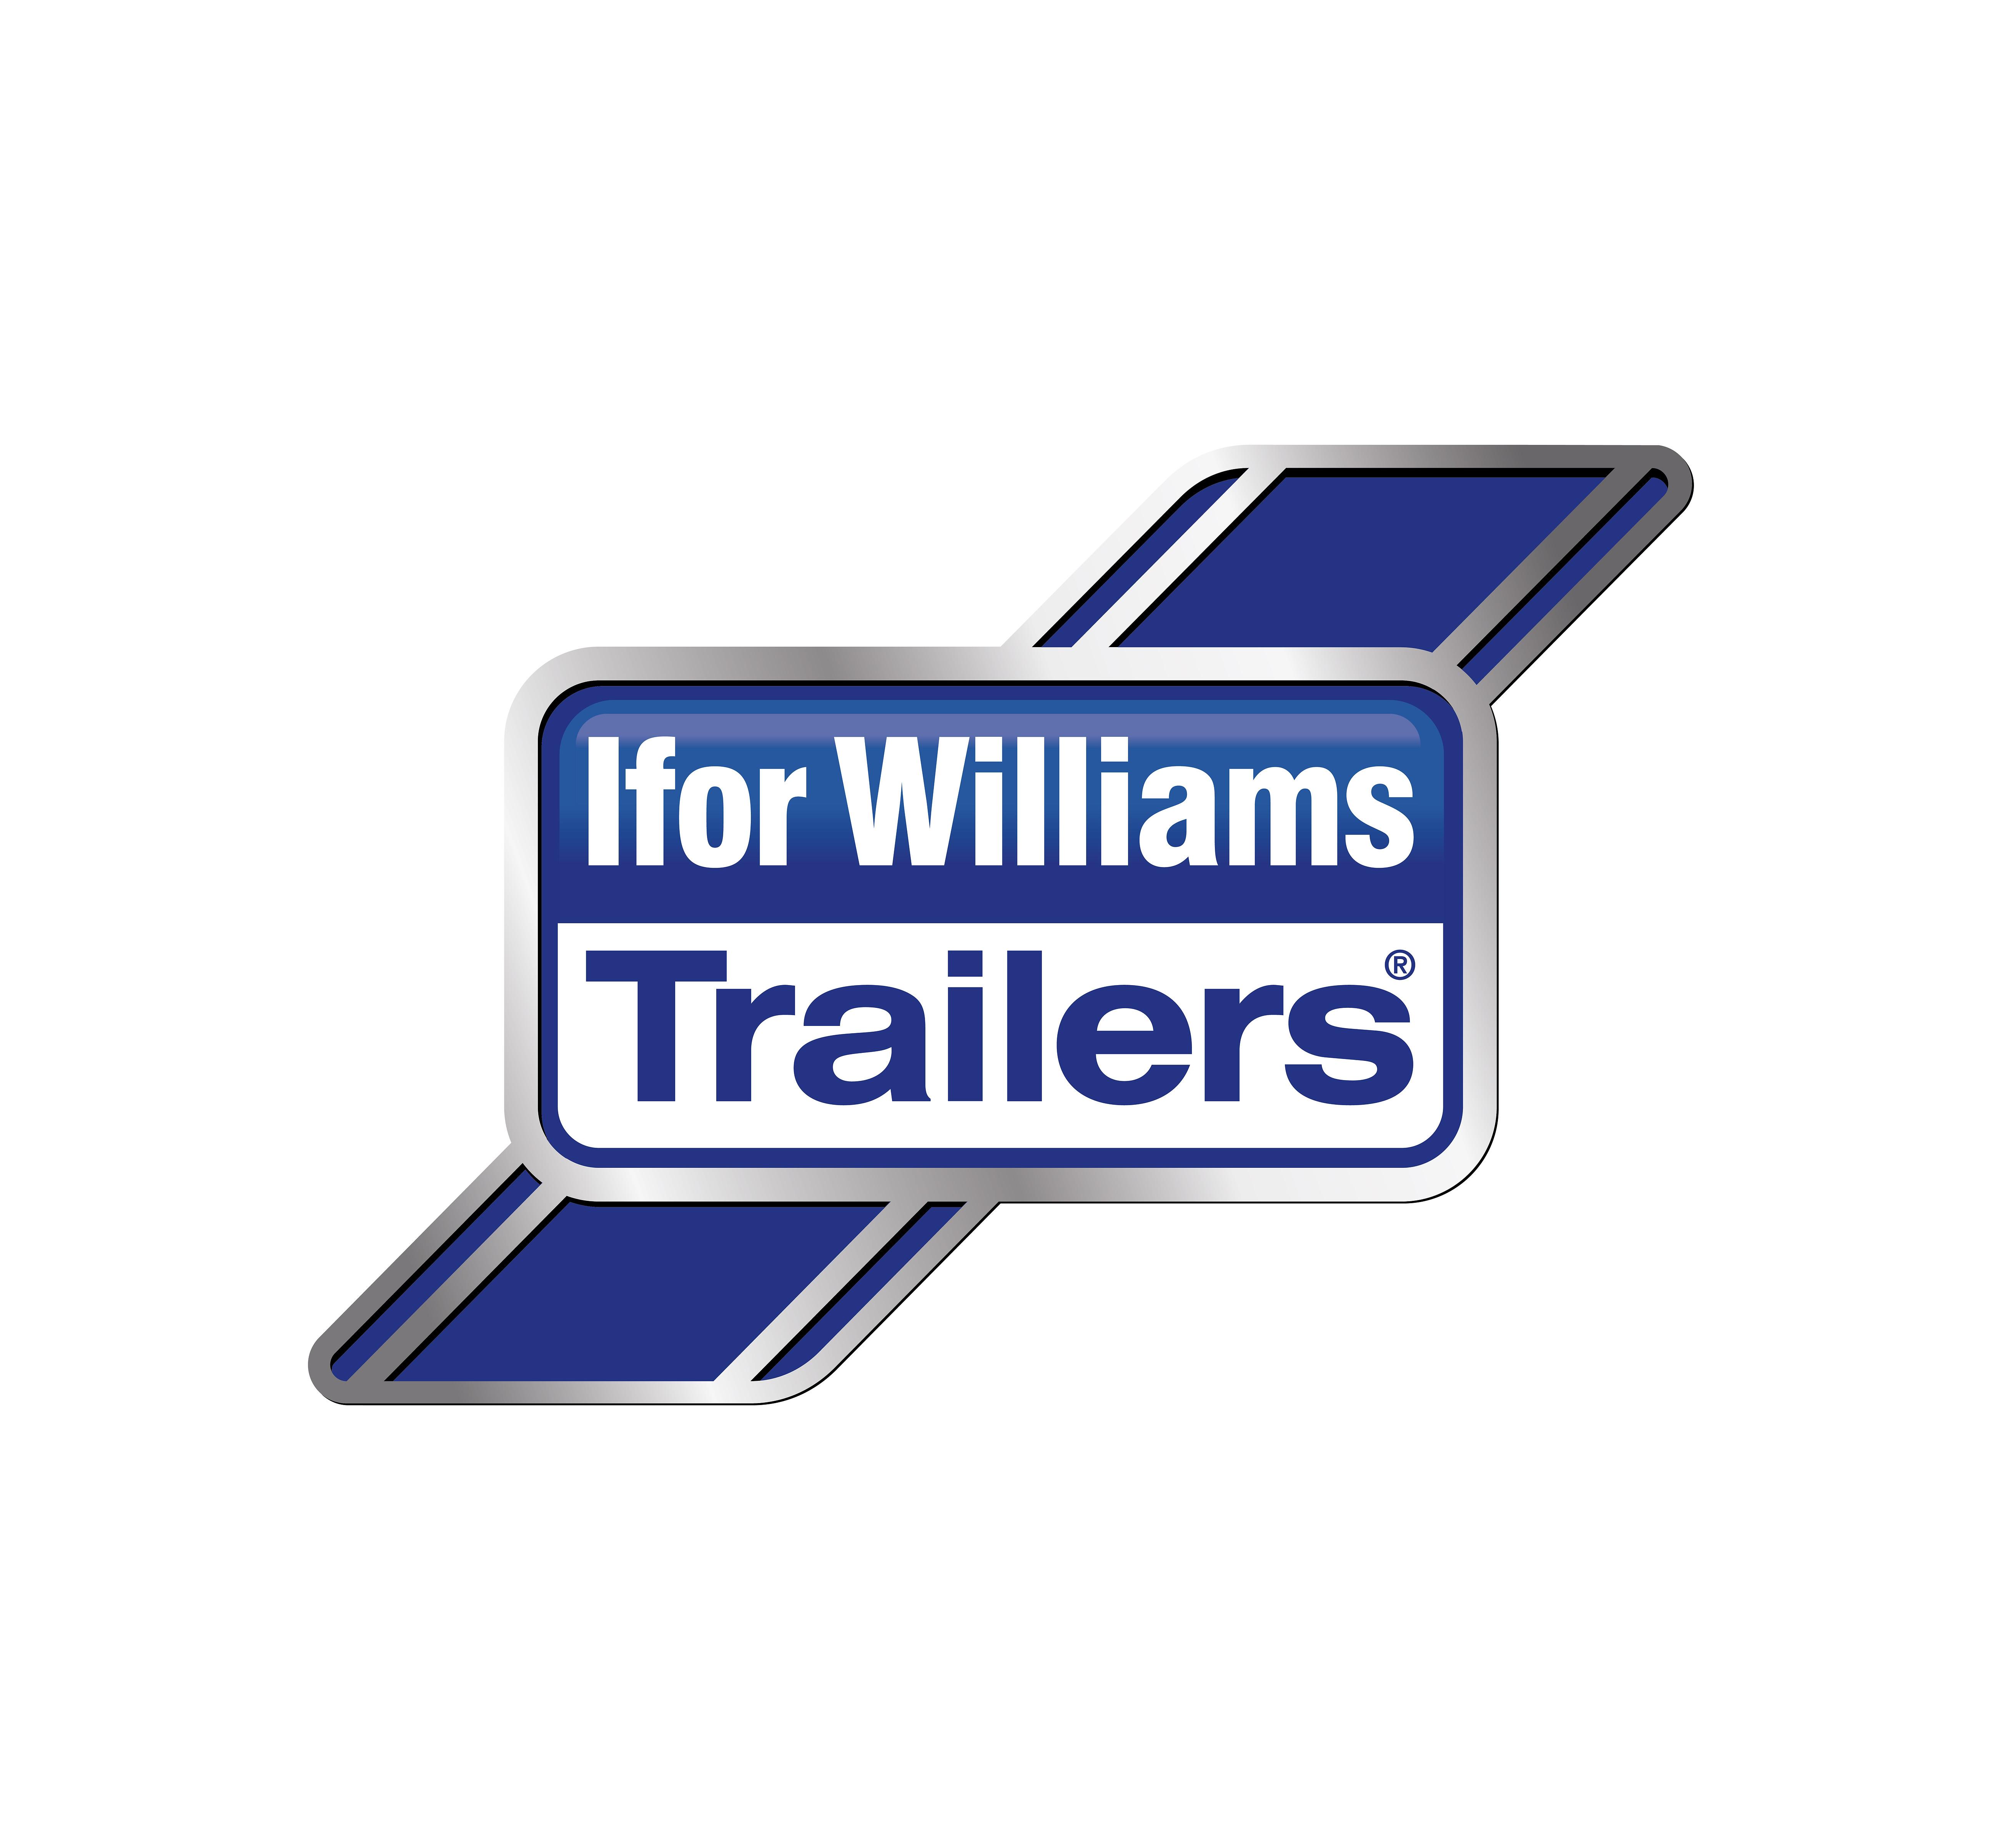 Trailer Service -       Ifor Williams